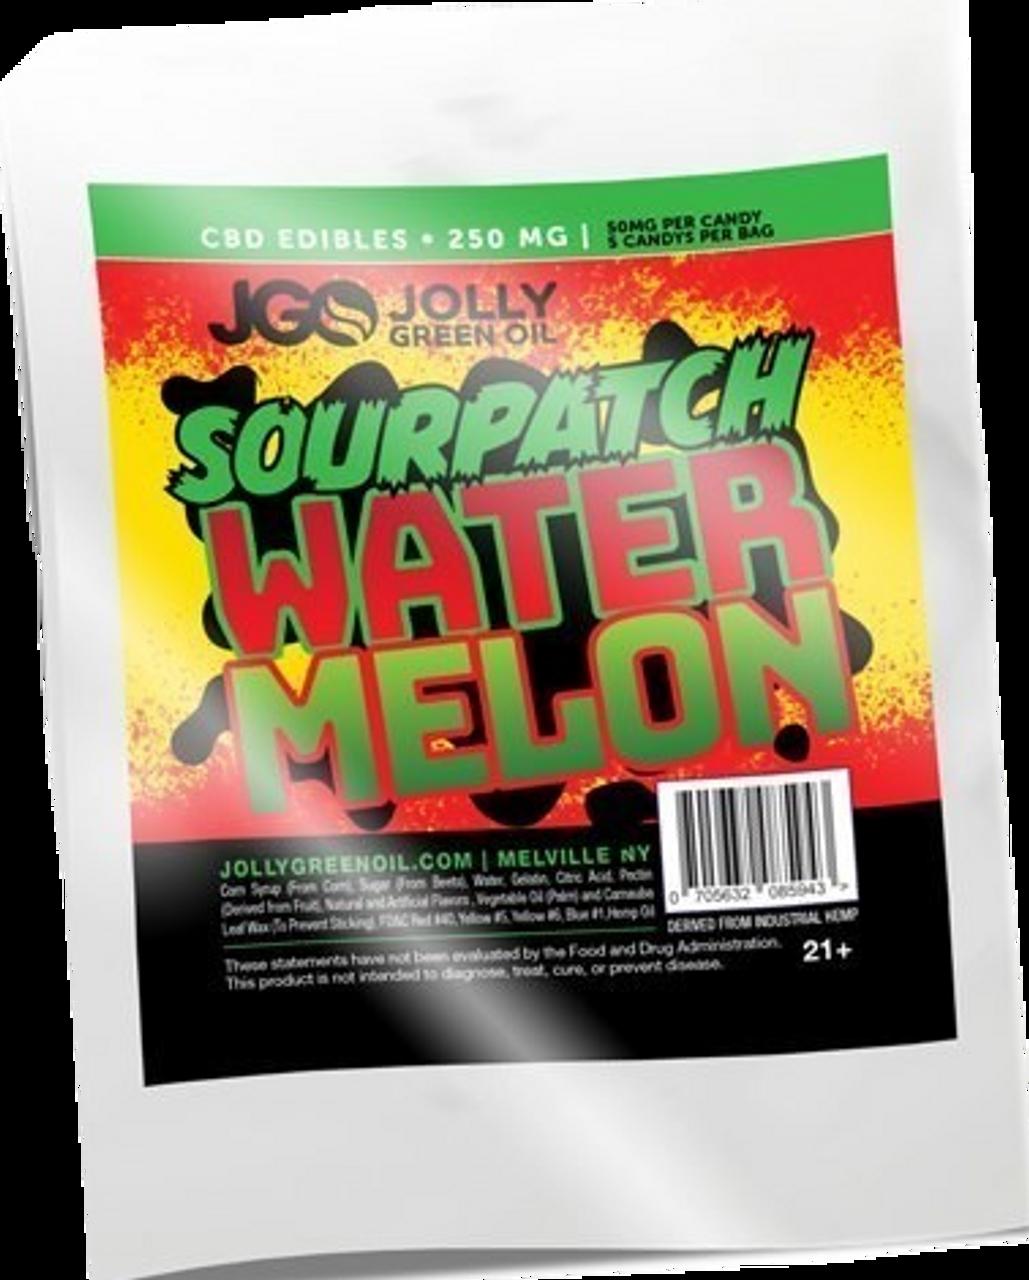 Jolly Green Oil: Sour Patch Watermelon CBD Gummies (250mg)